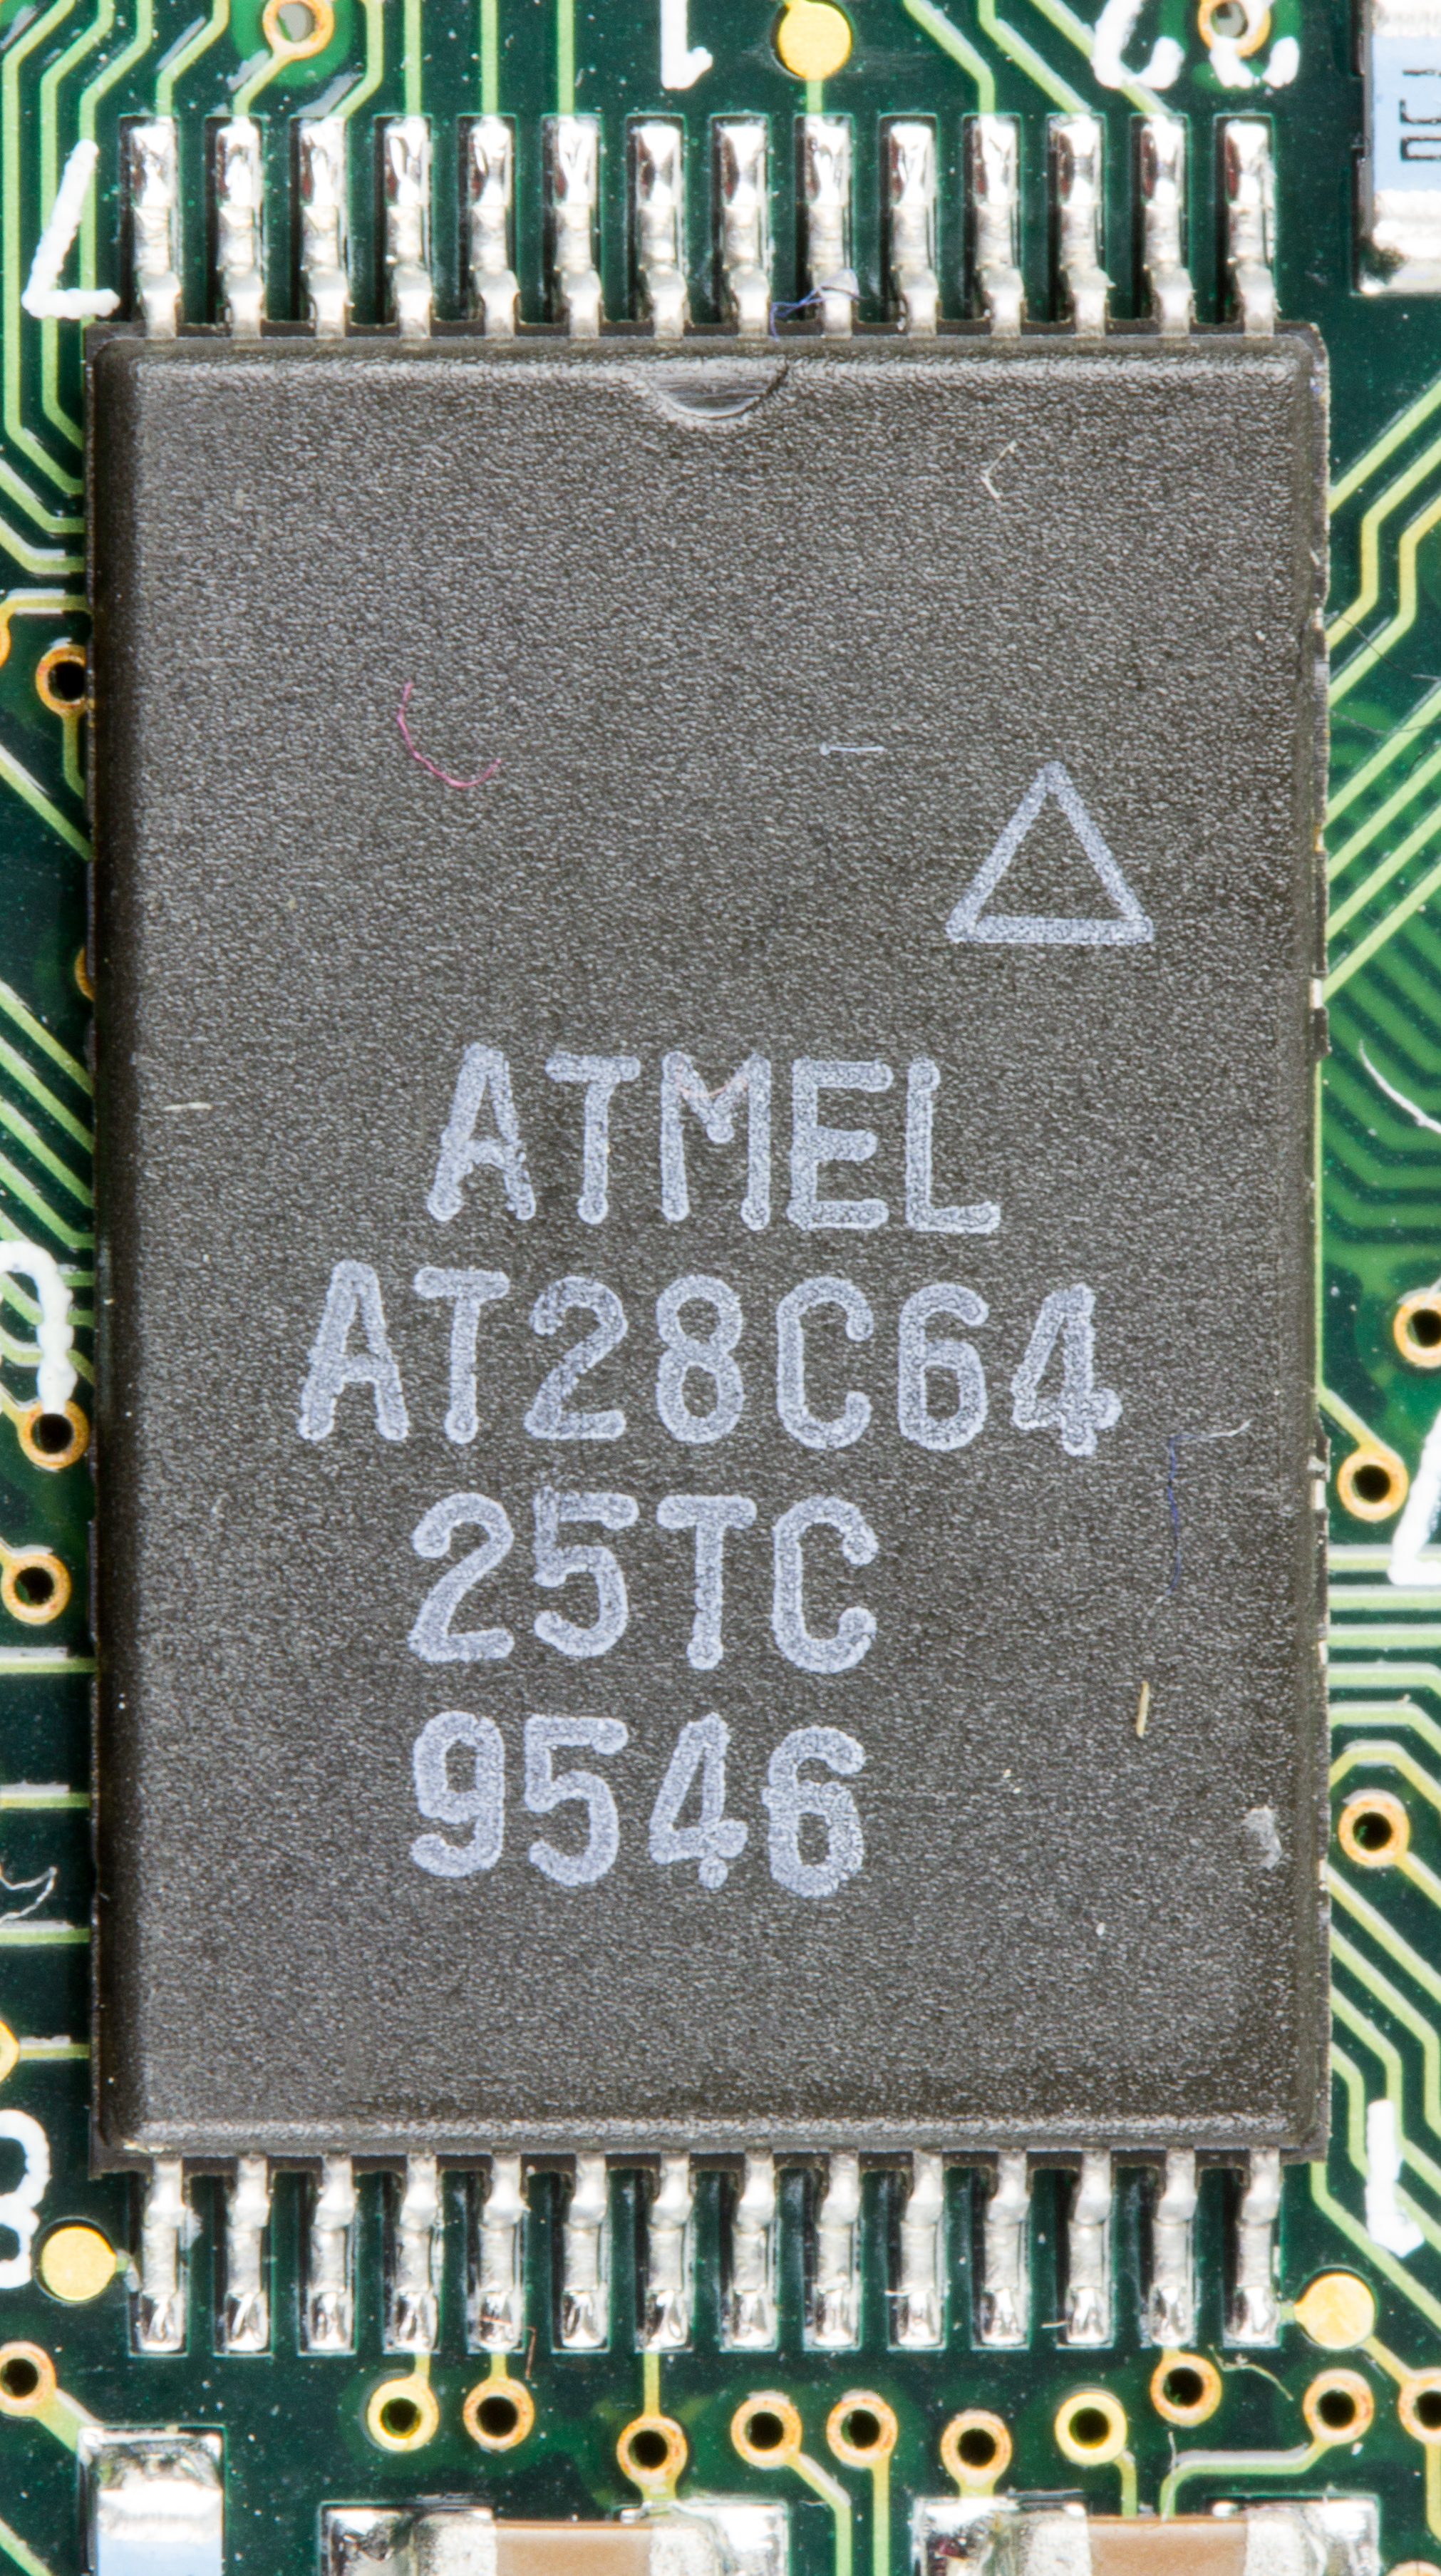 ATMEL PCMCIA DRIVERS FOR WINDOWS